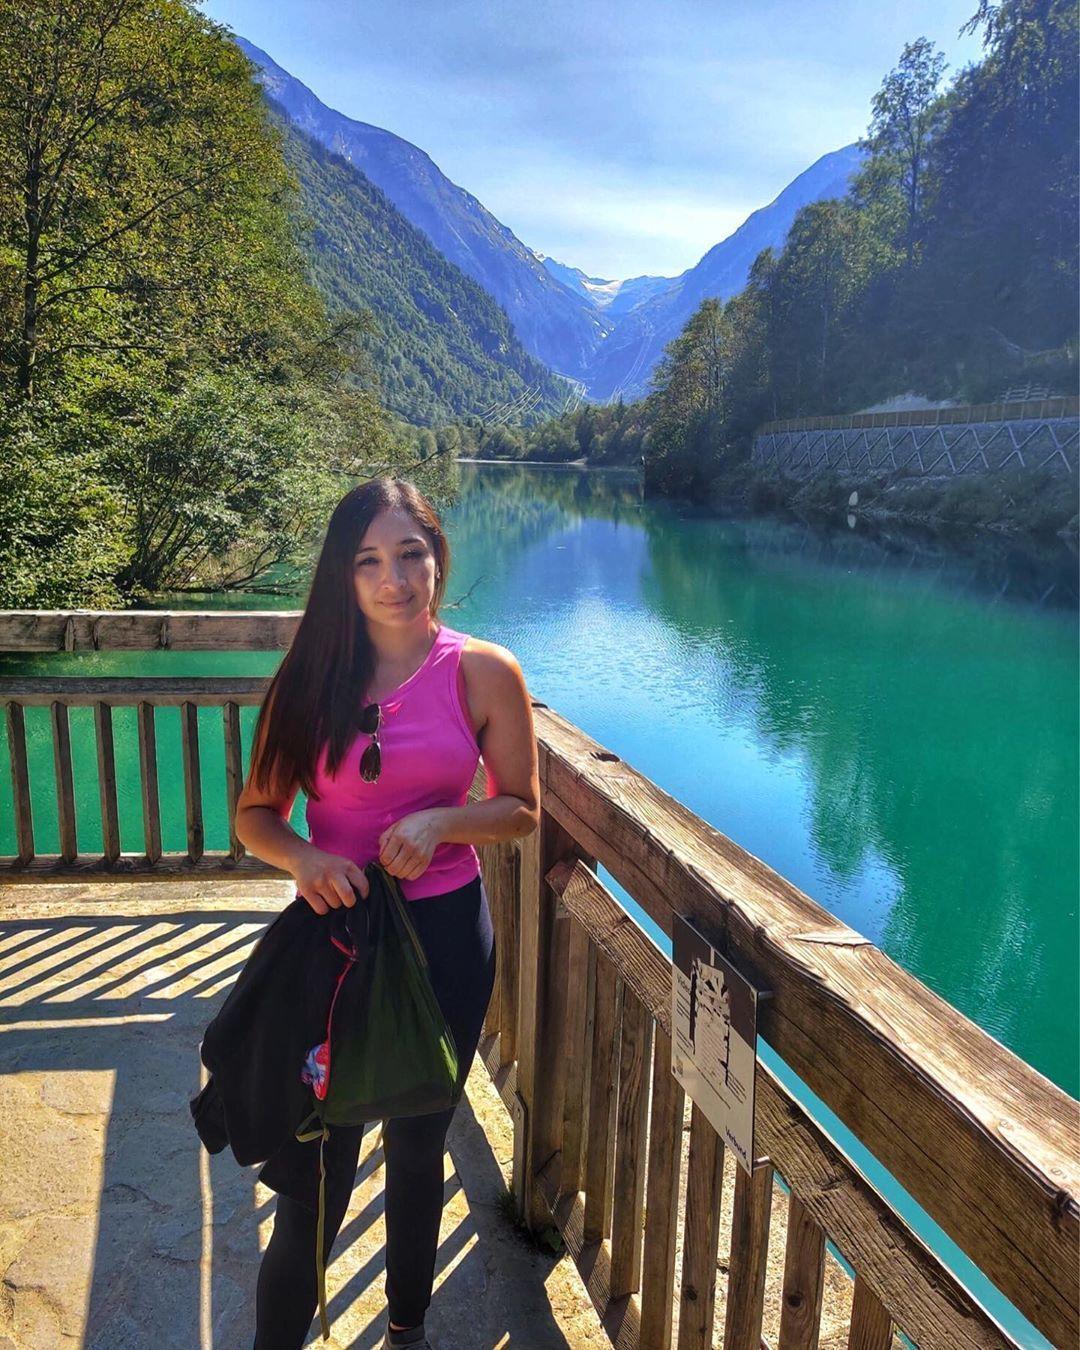 🌱Nature🌱💓🇦🇹 #nature #photograph #austria #lake #explore #landscapephotography #glacier #forest #picoftheday #view #trip #traveladdict #natgeoyourshot #pic #photographer